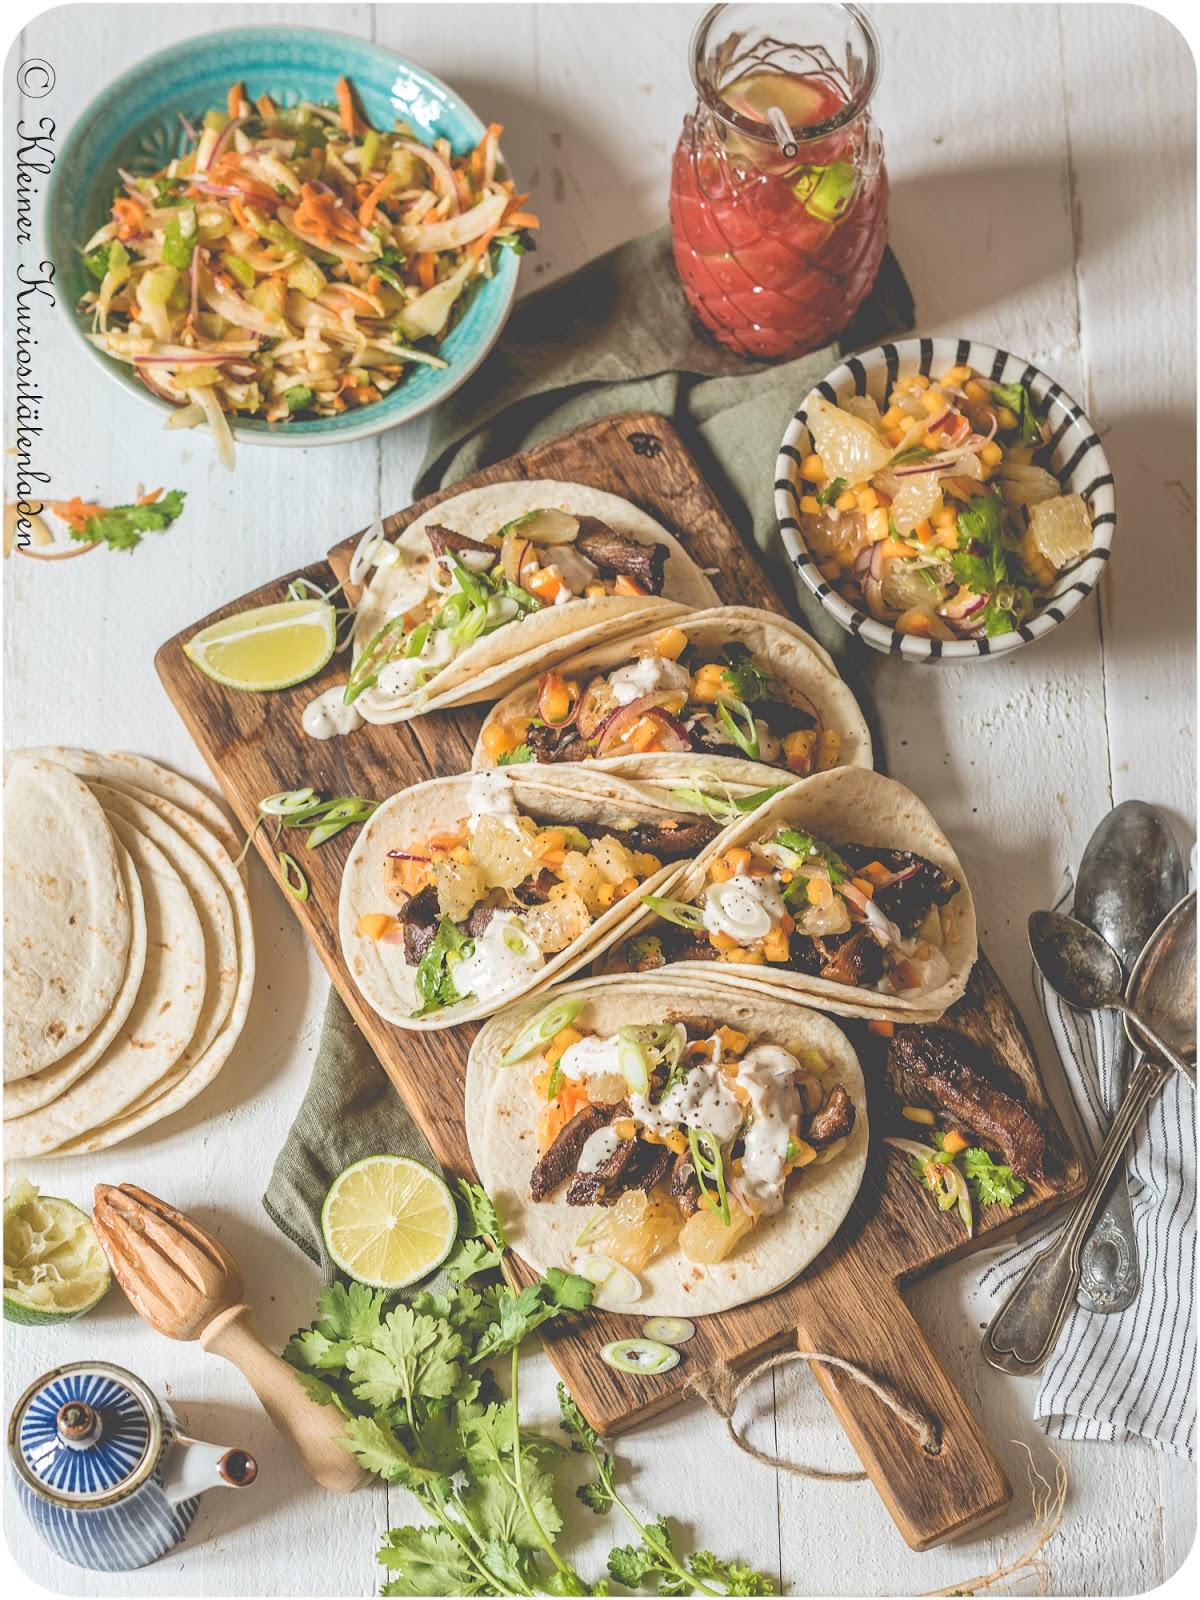 Tacos mit Rinderzunge | Tacos de Lengua